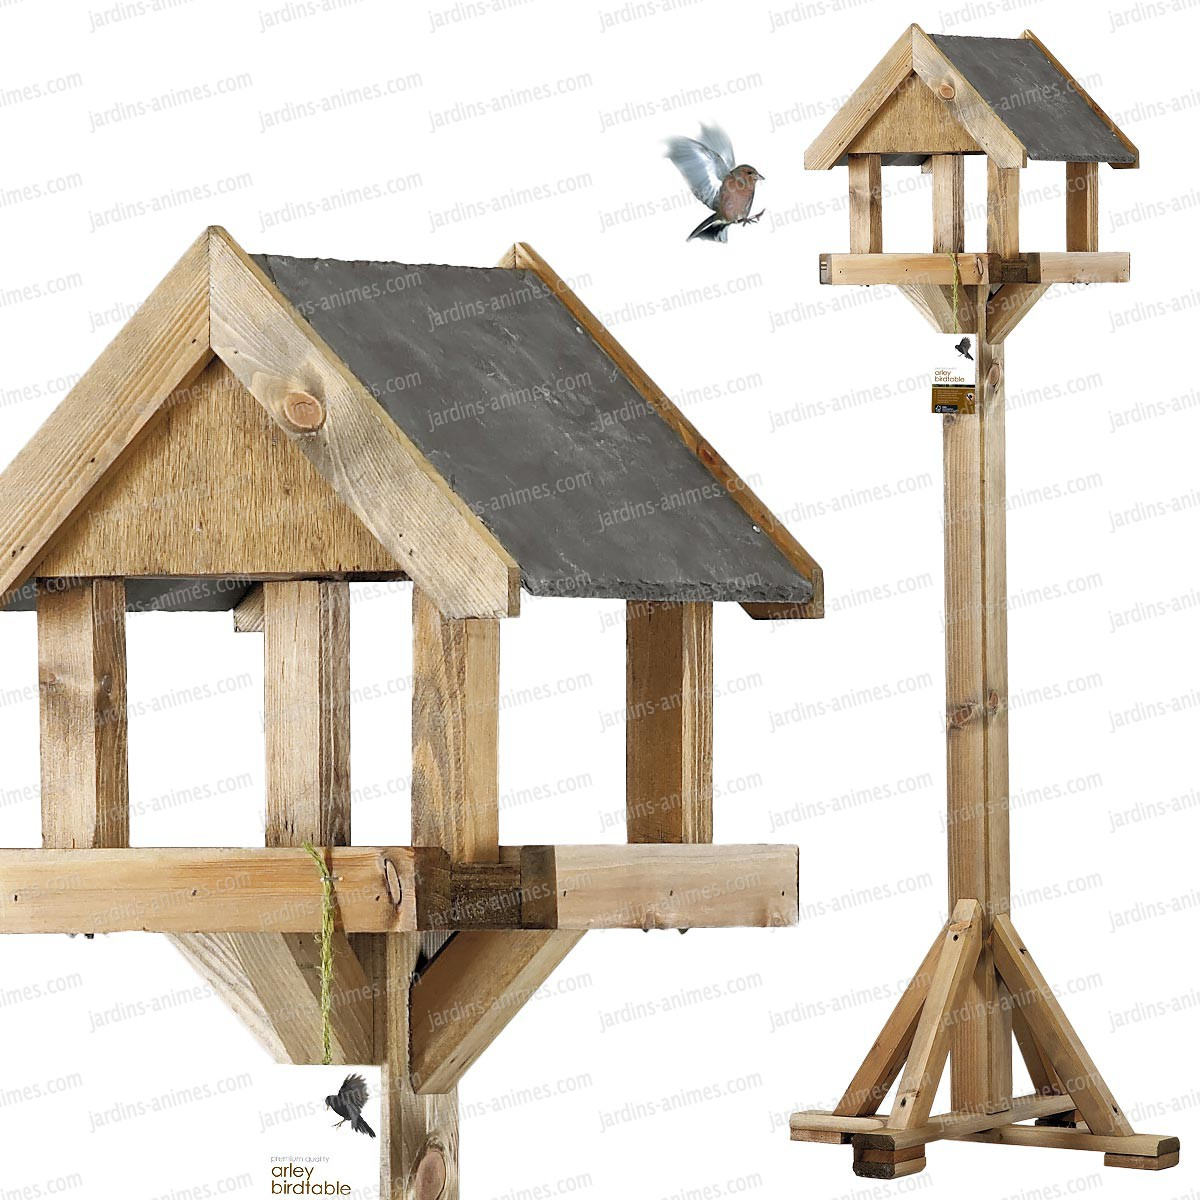 Mangeoire sur pied toit ardoise mangeoires bains d 39 oiseaux for Mangeoire sur pied pour oiseaux du jardin